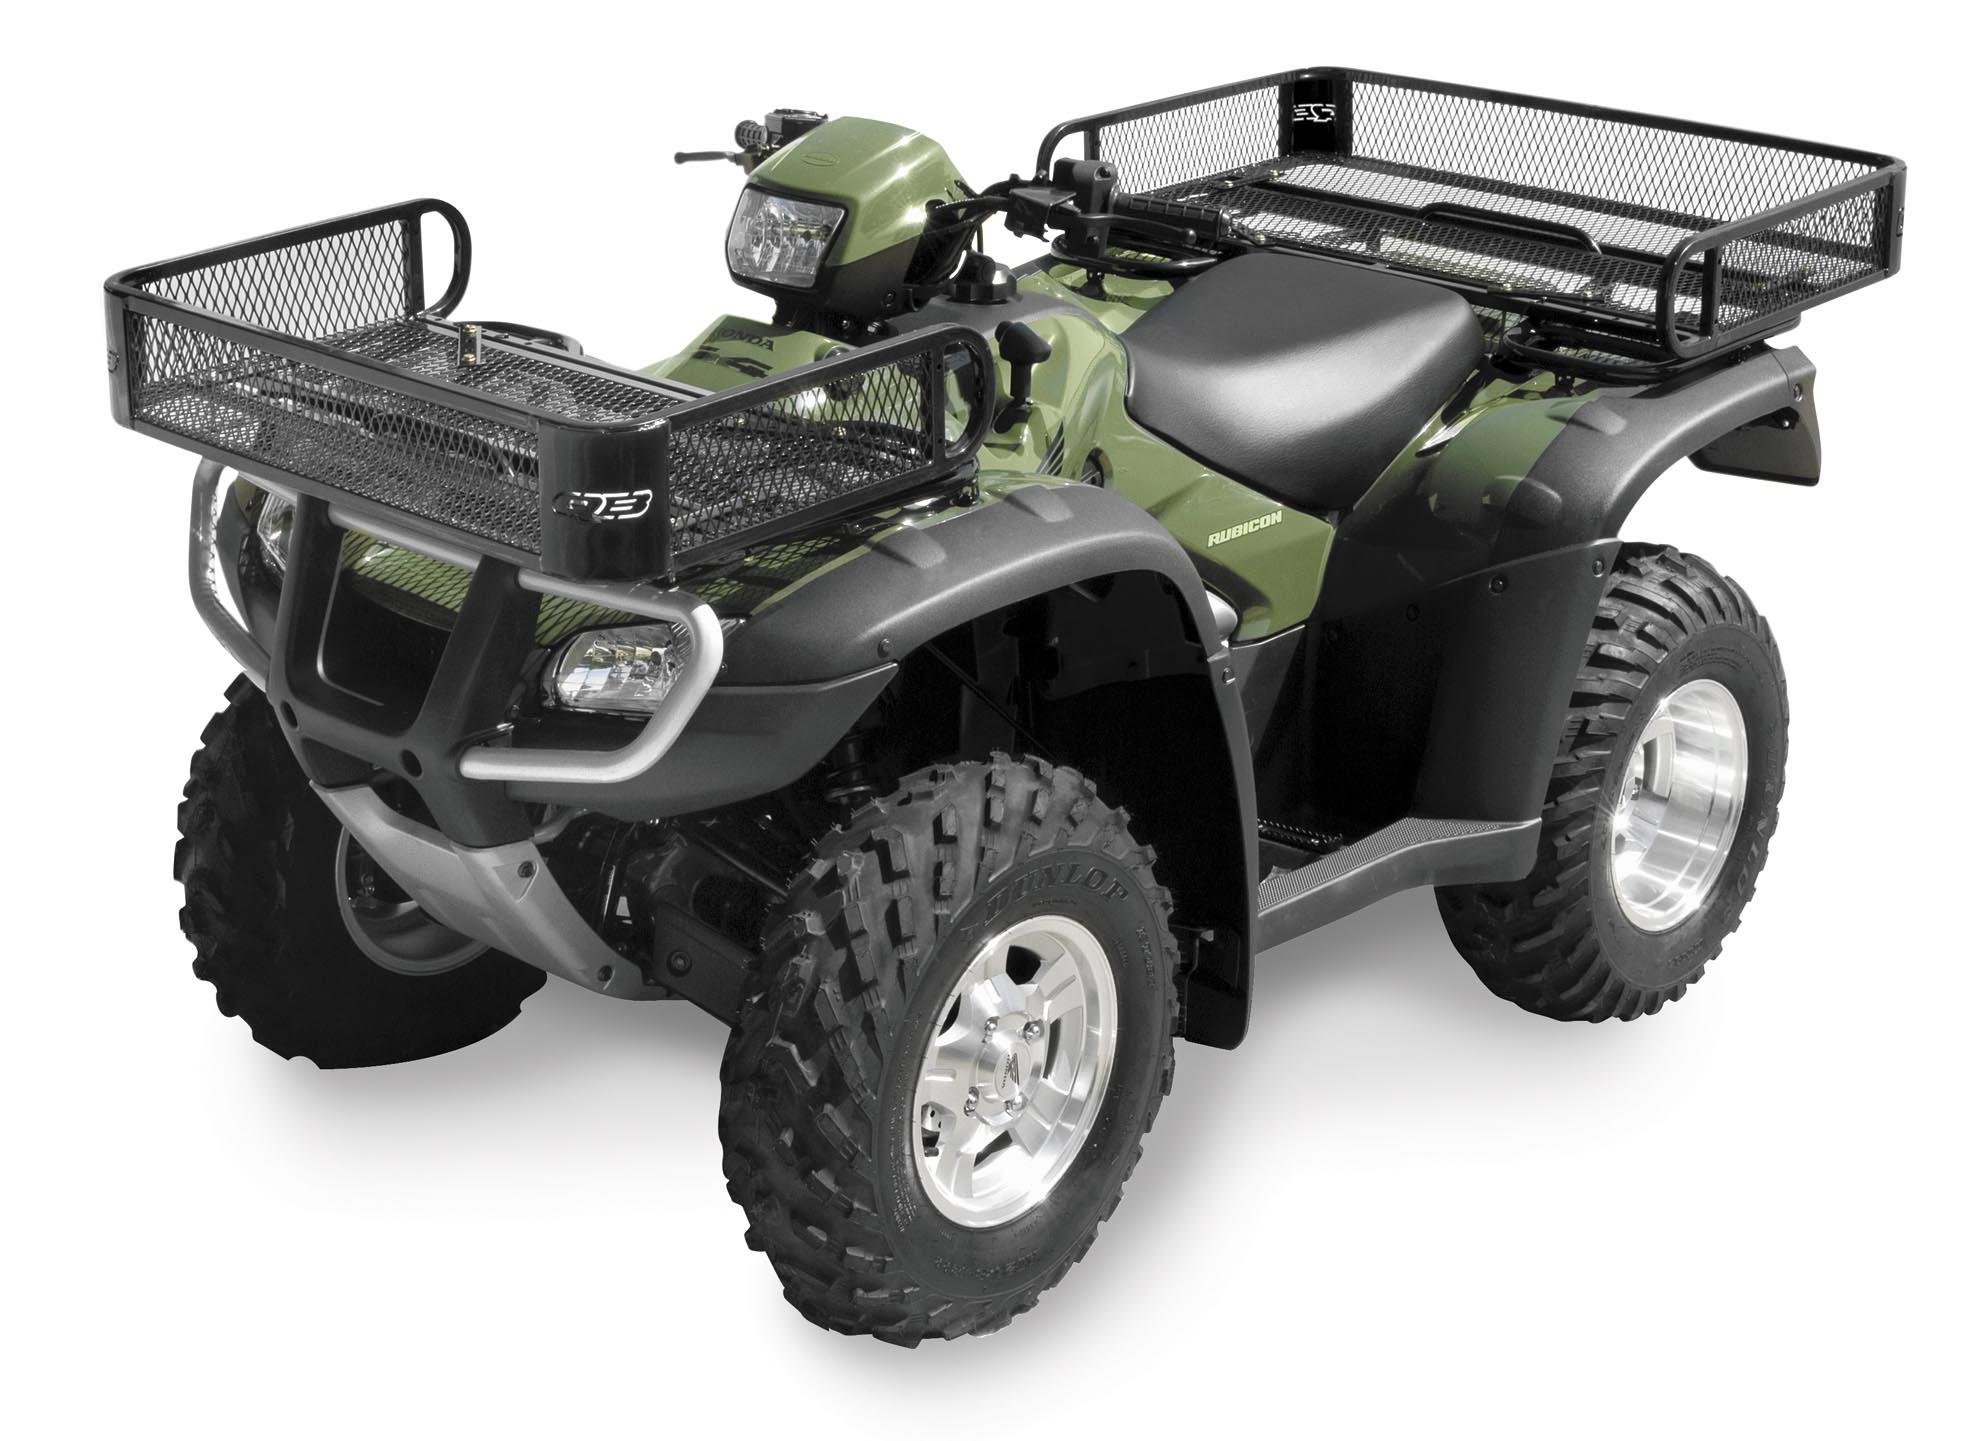 Quadboss Front Wheel Bearing Kit for Arctic Cat 500 FIS TBX 4x4 2003